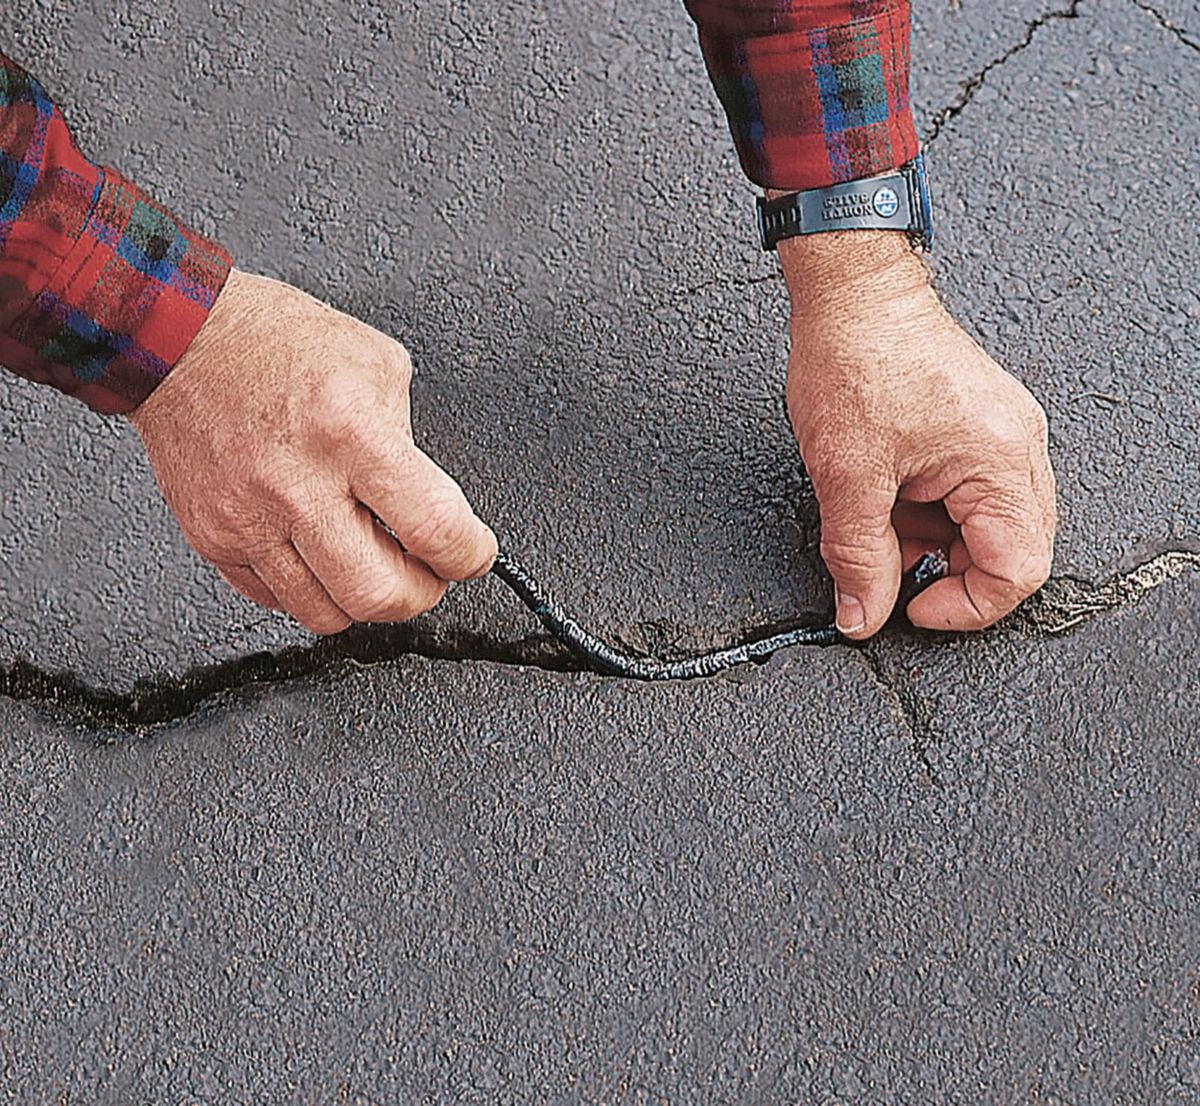 Fall 2021 Landscaping, Fall checklist, driveway cracks